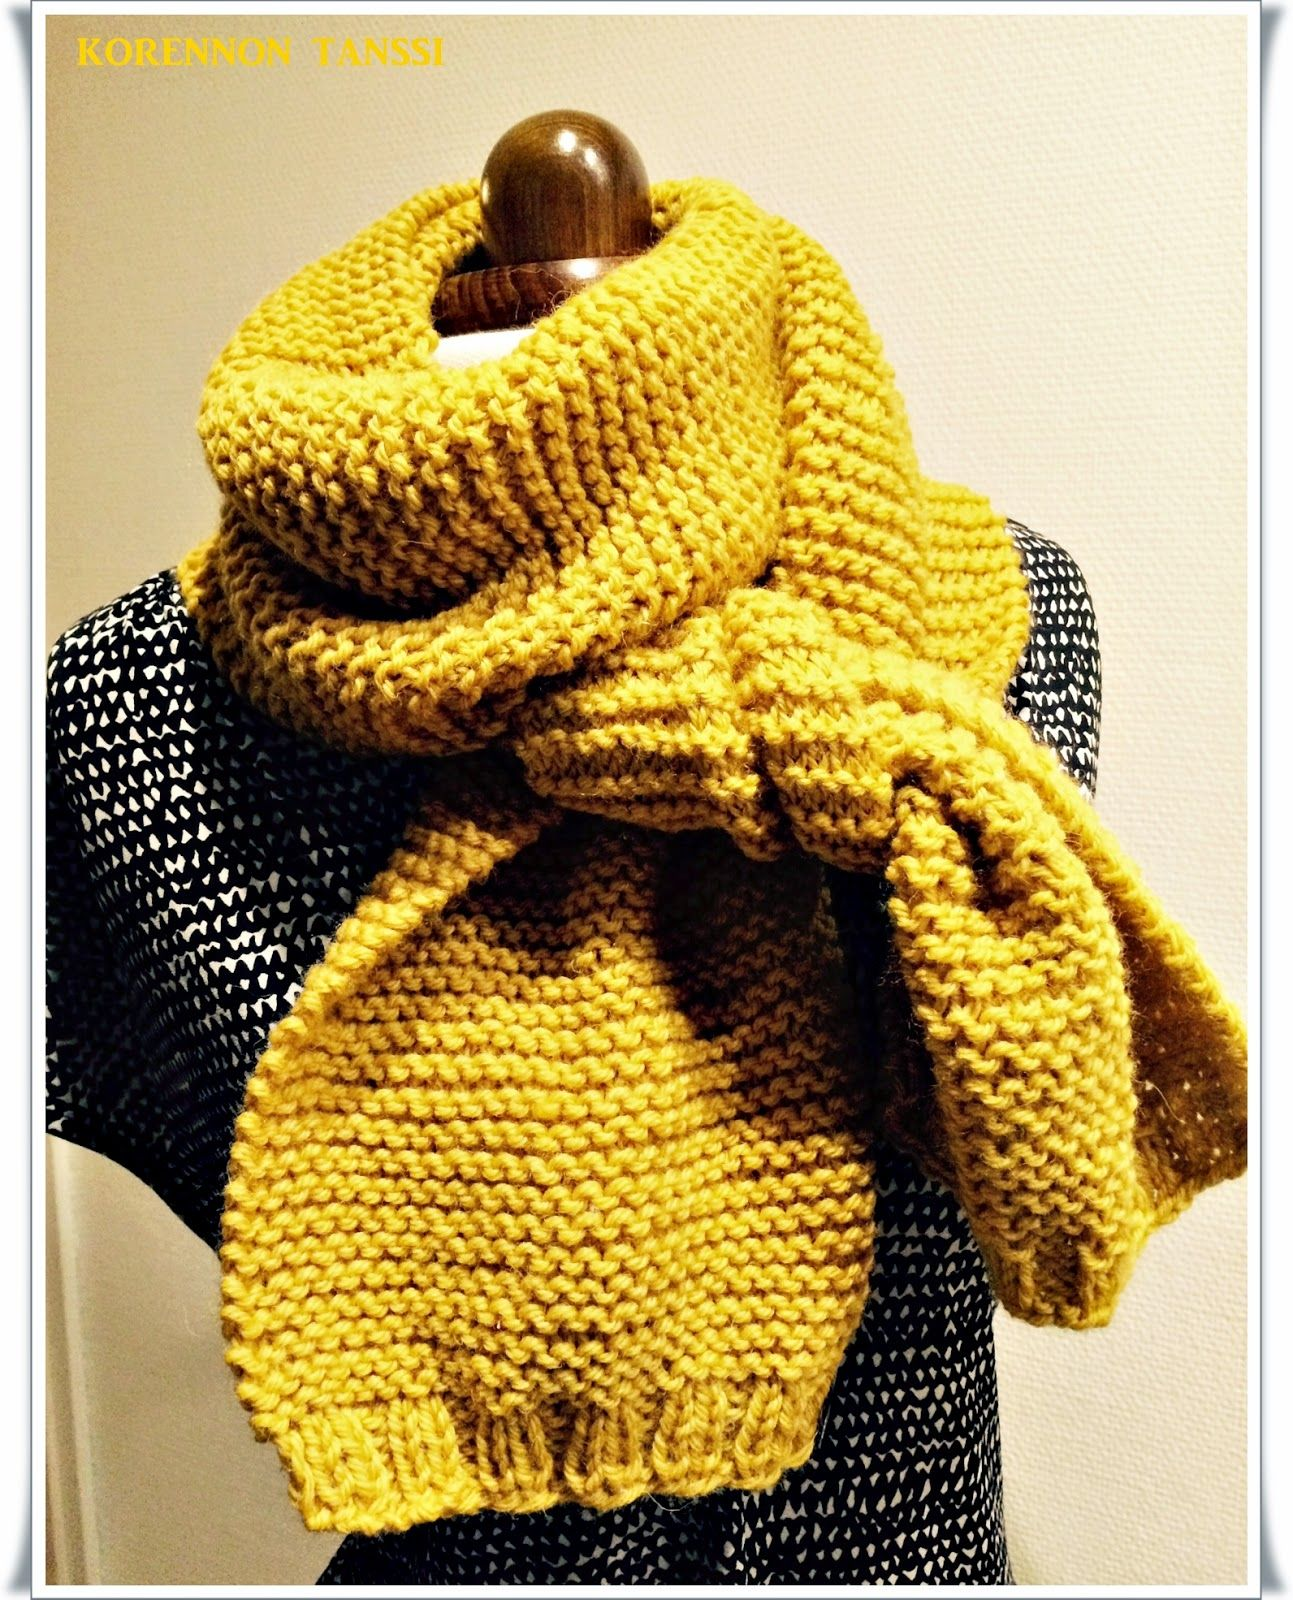 scarf / Korennon tanssi